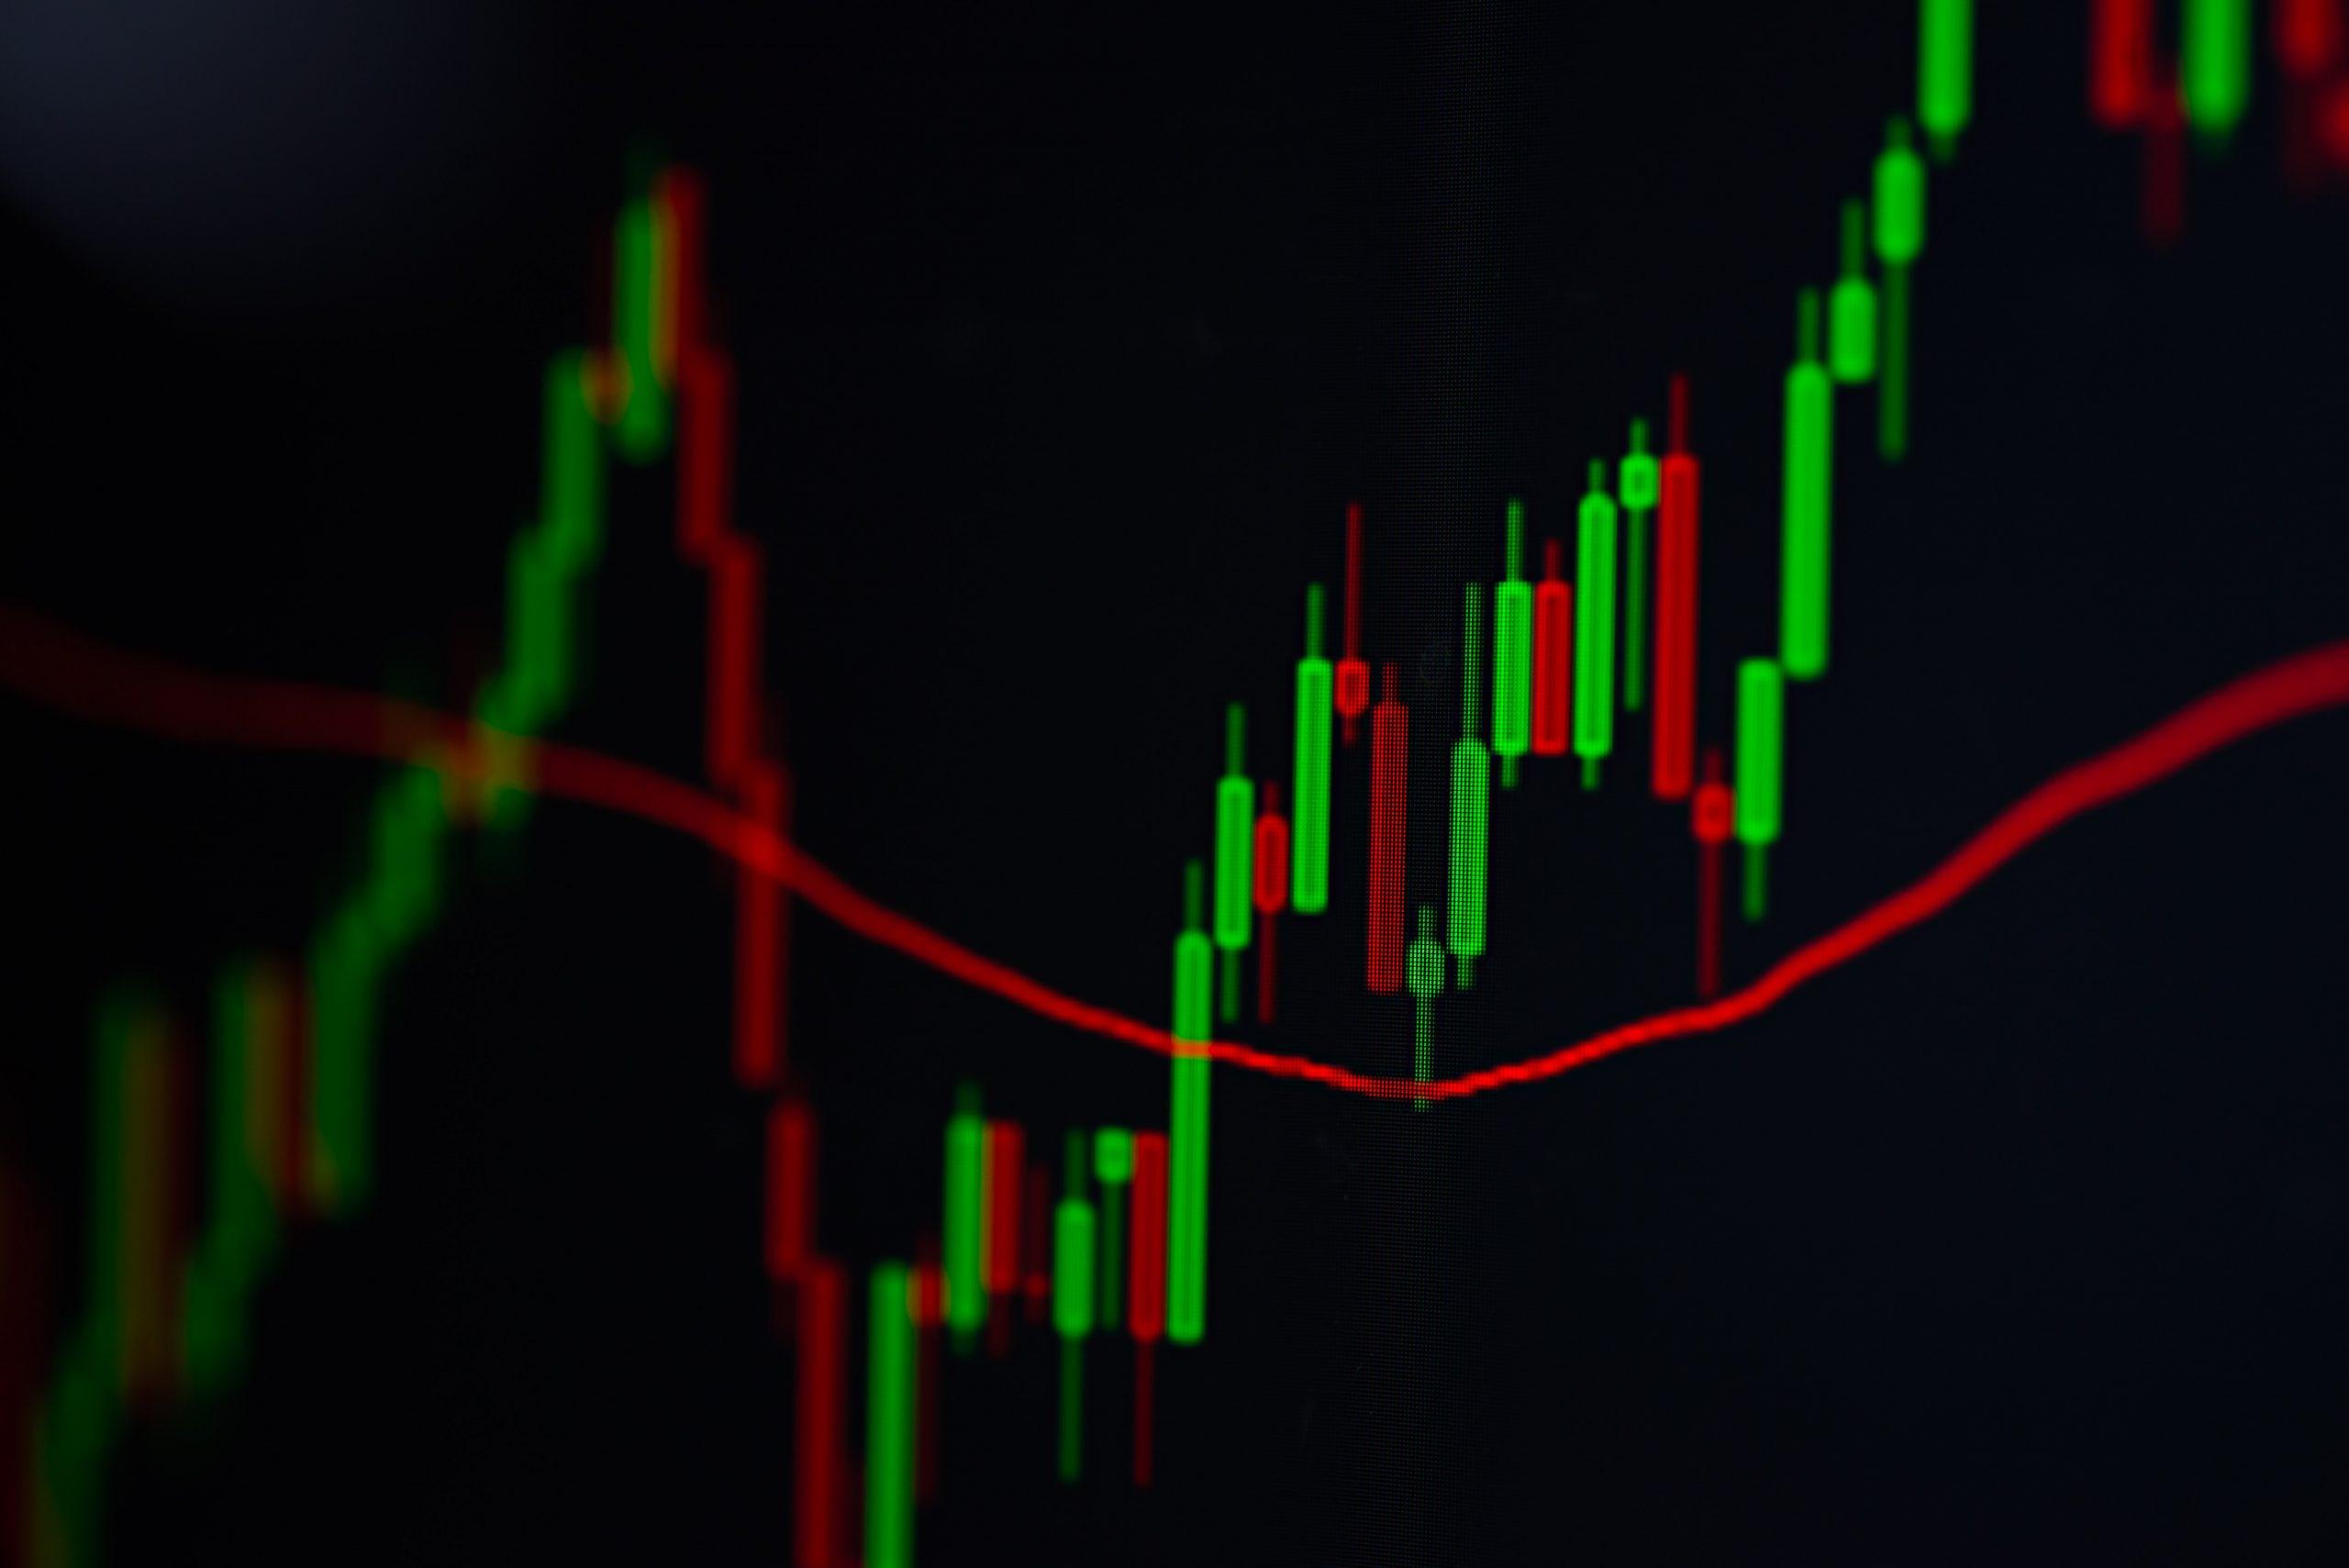 stock trading graph closeup